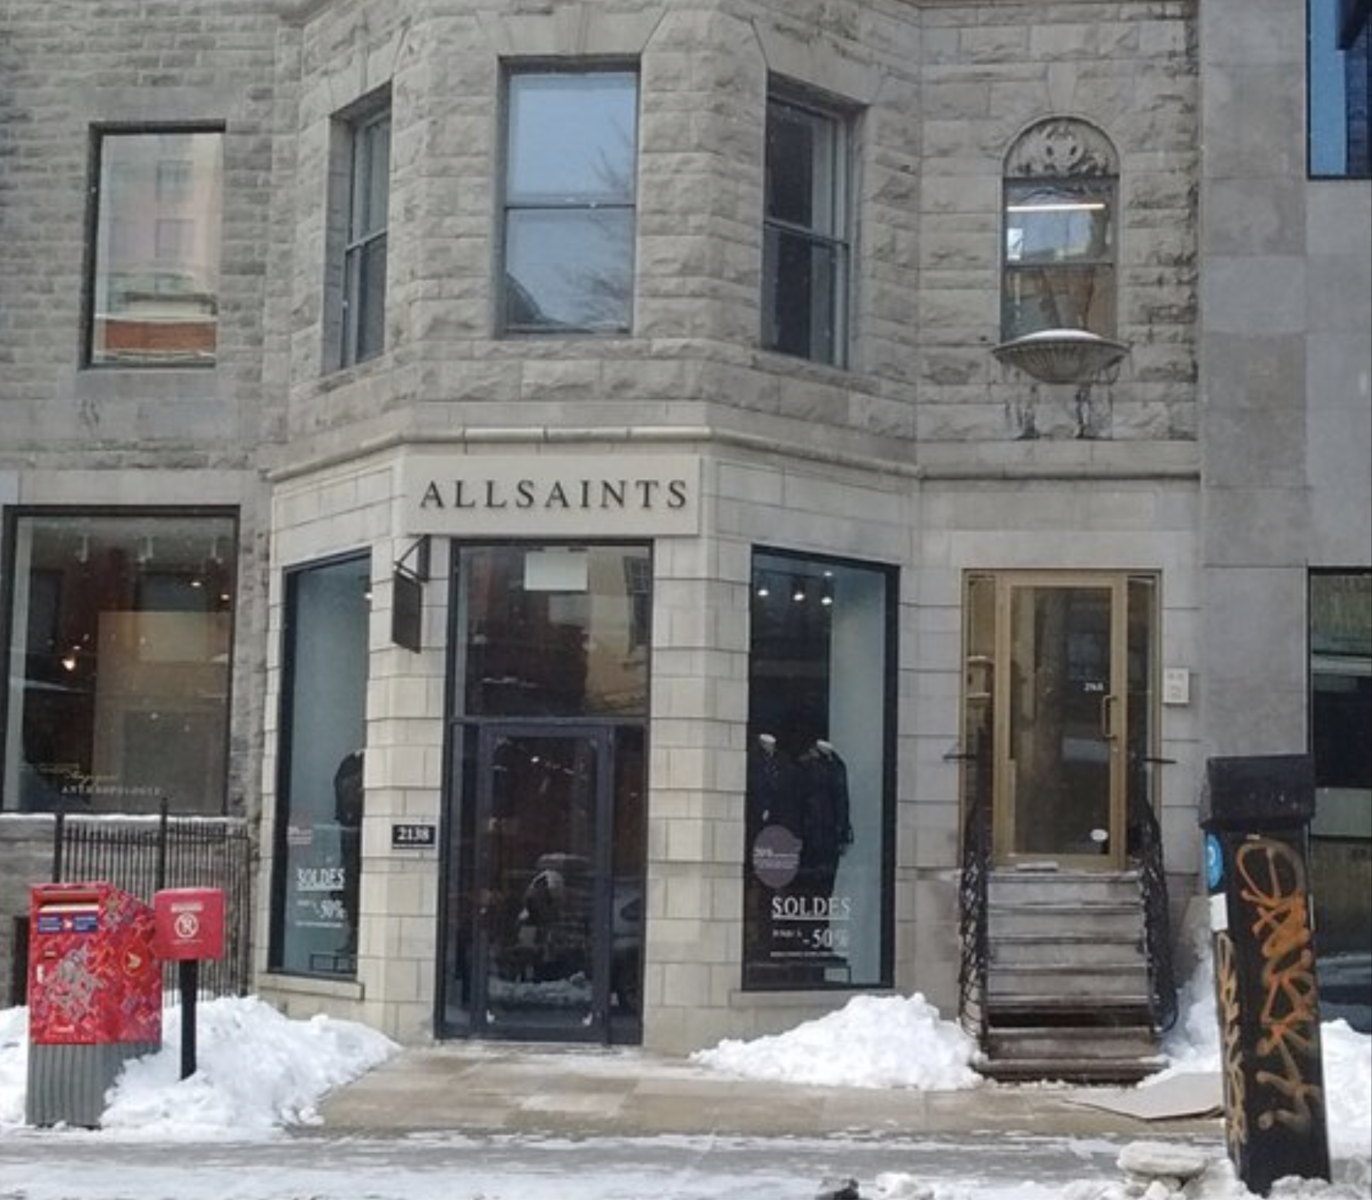 ALLSAINTS Montreal